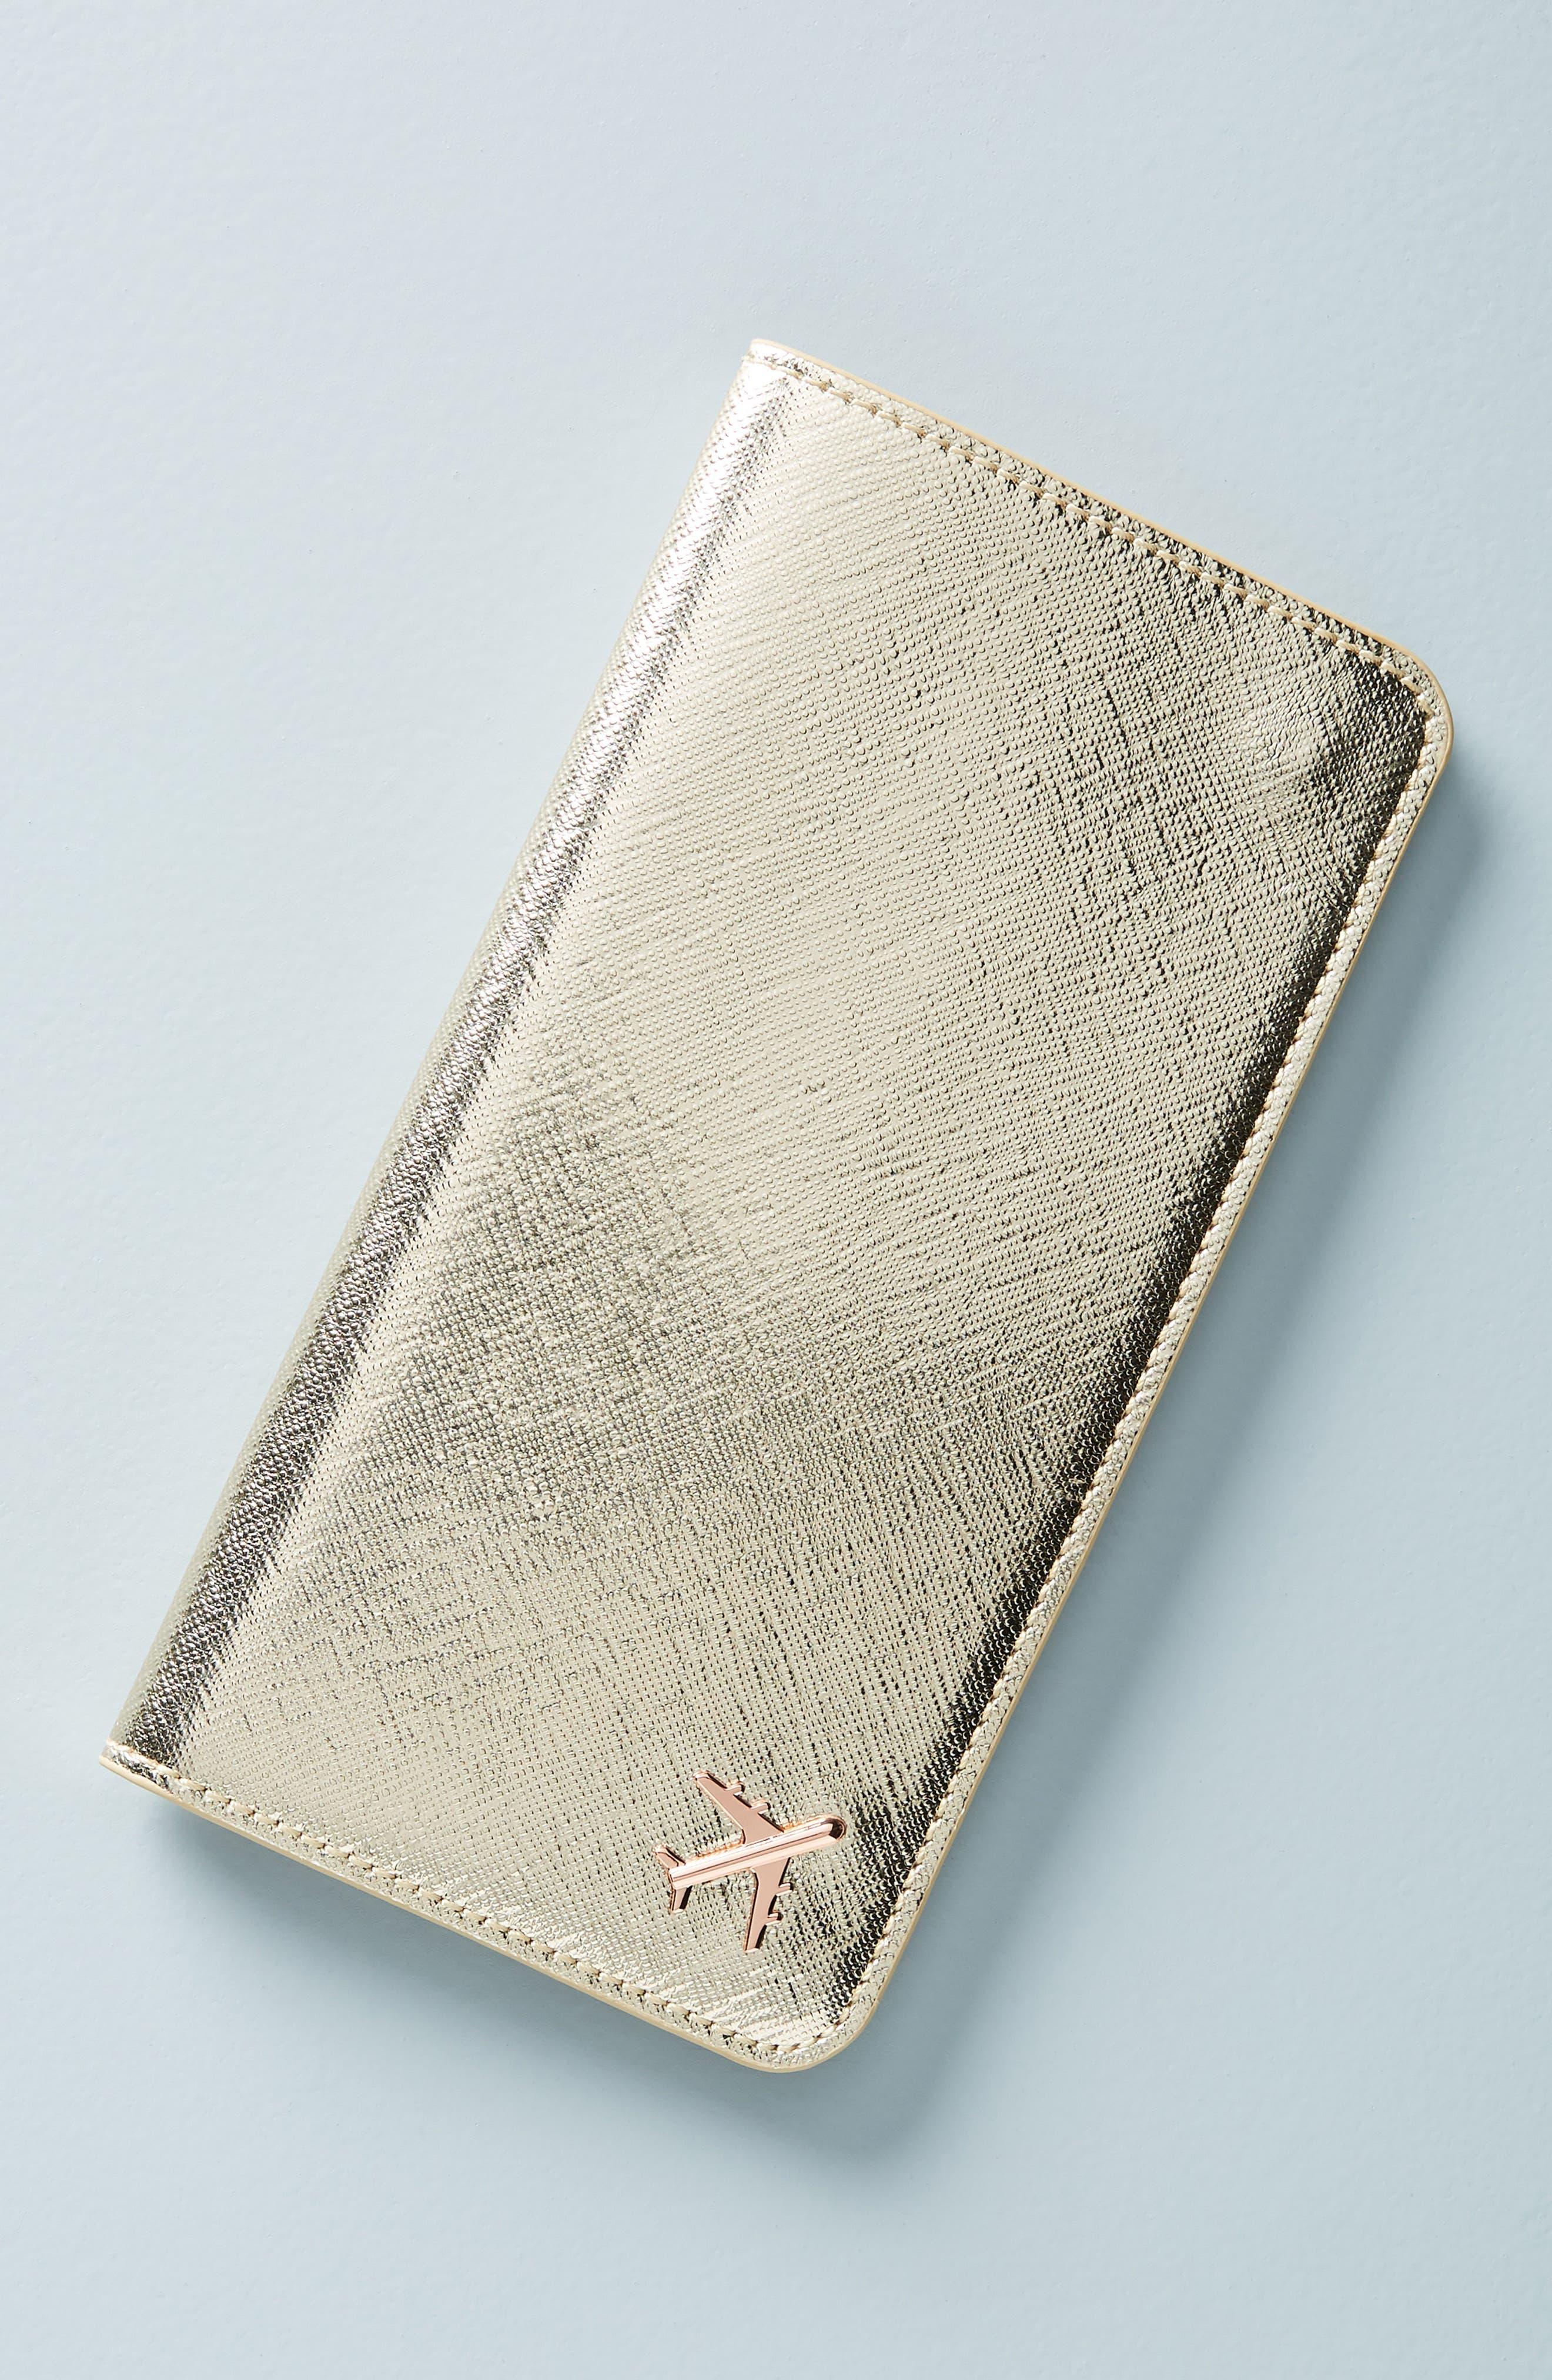 Celeste Travel Wallet,                         Main,                         color, GOLD